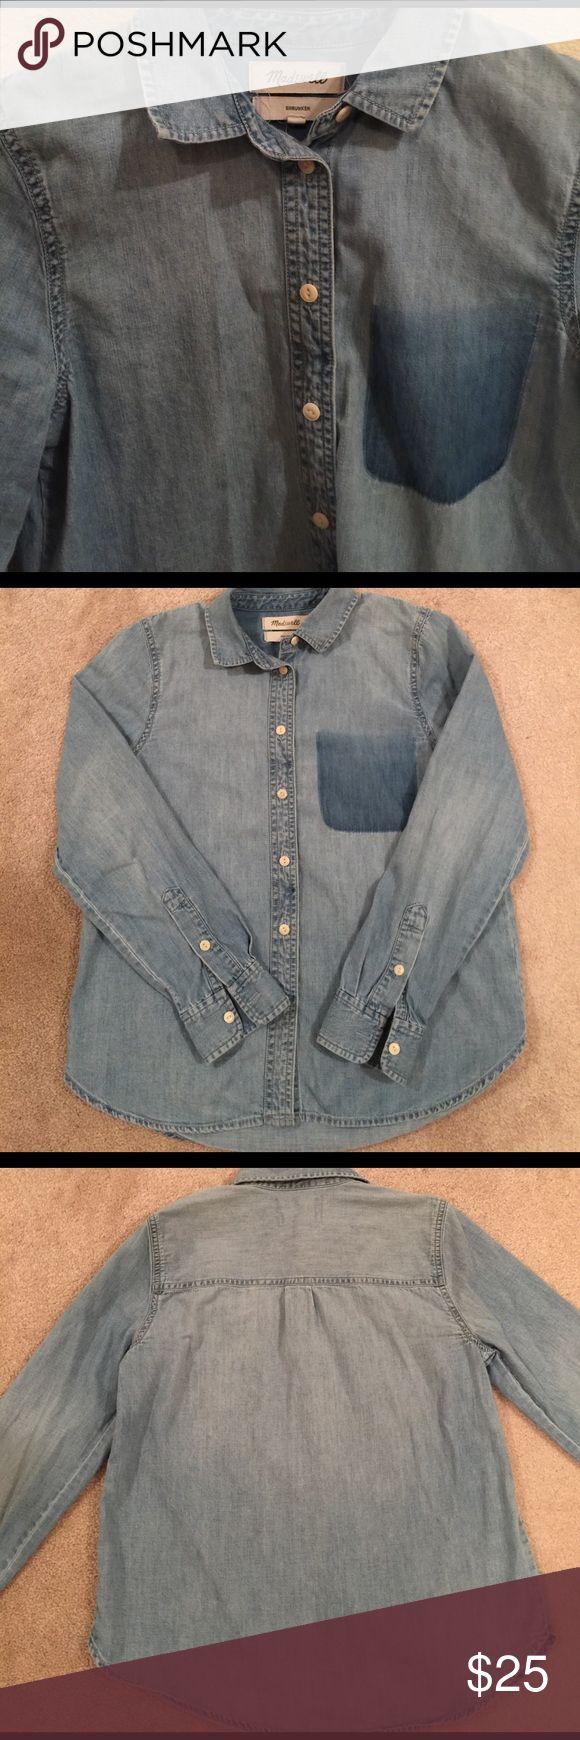 Madewell Denim button down shirt 100% cotton denim button down shirt with printed pocket. Madewell Tops Button Down Shirts